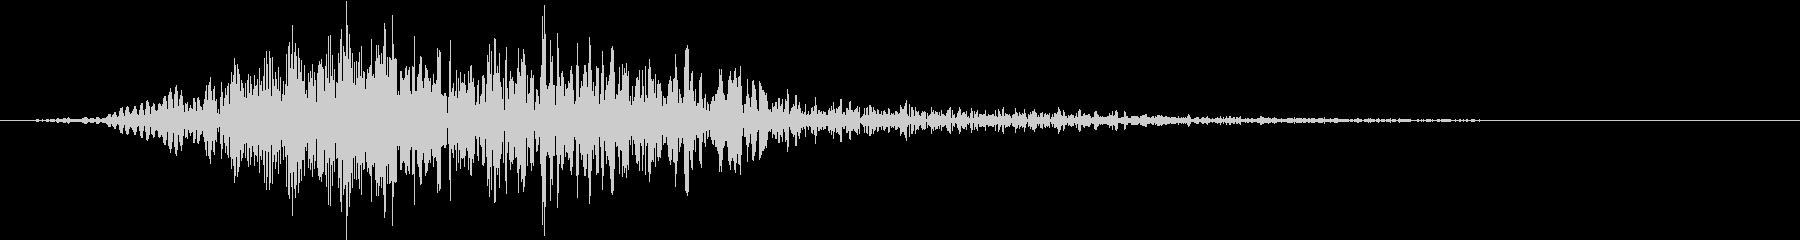 Shout YA !! _short's unreproduced waveform